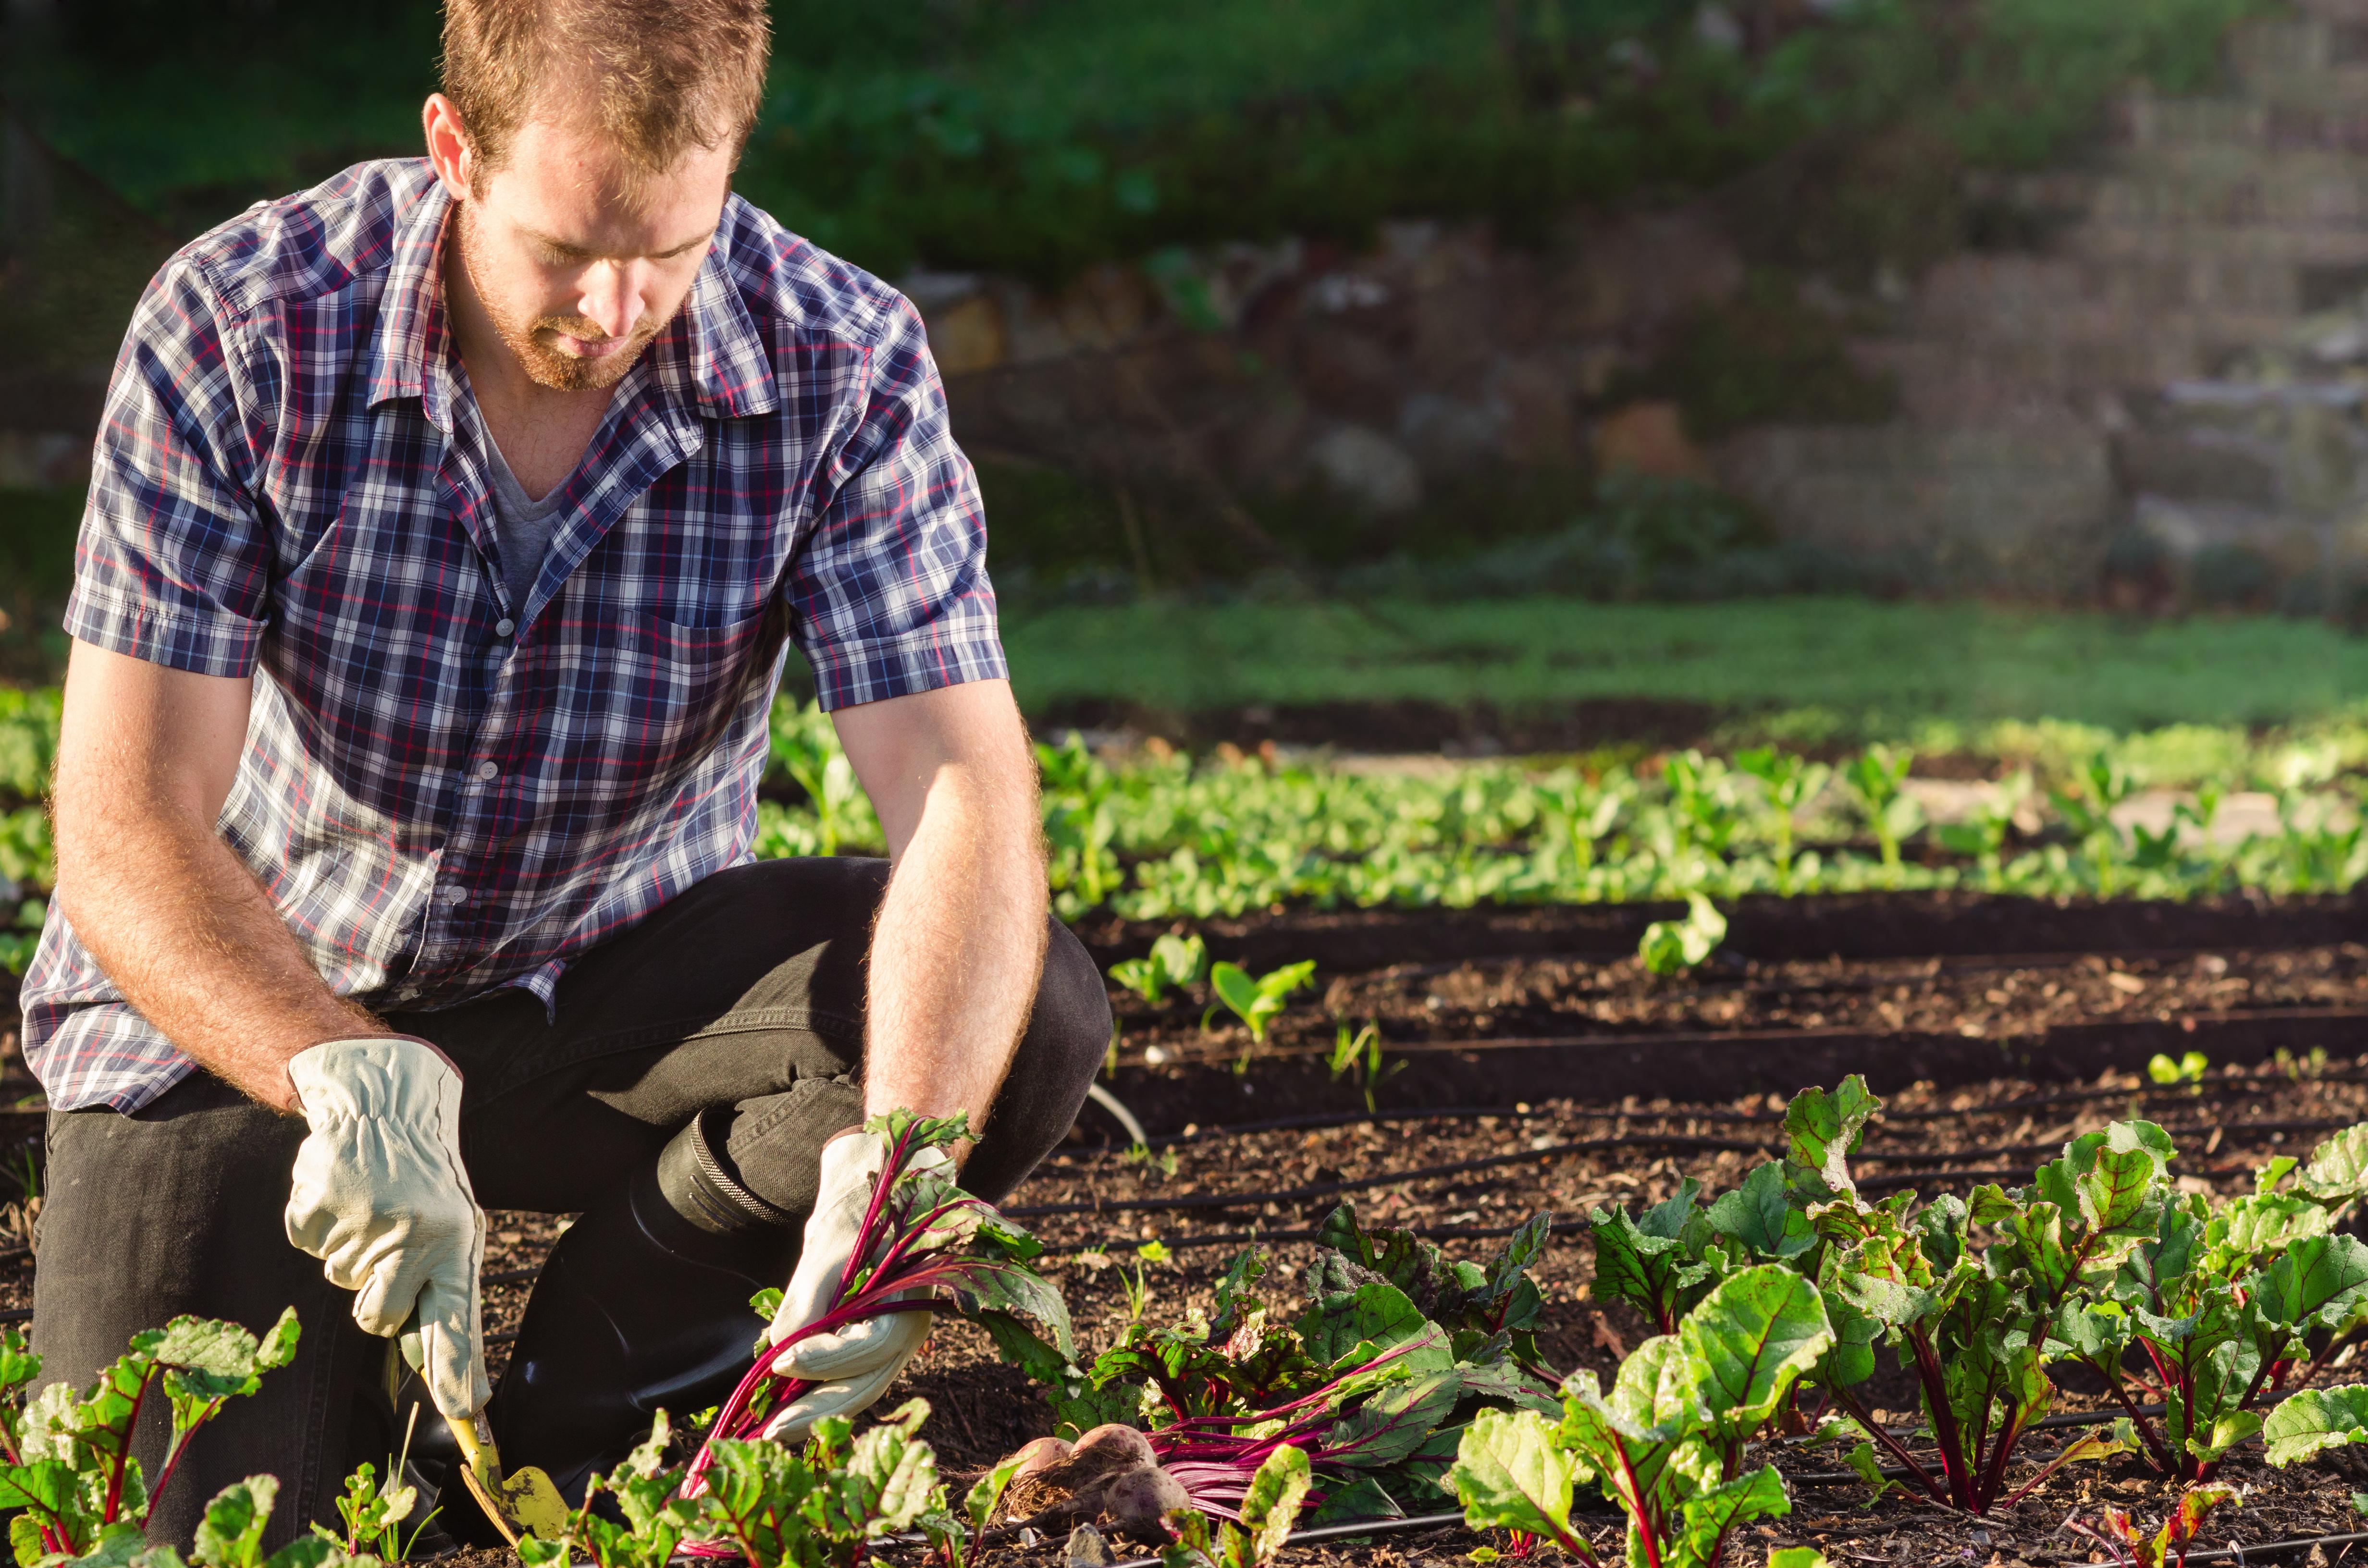 Vegetable garden pictures for kids - Farmer Harvesting Beetroot In The Vegetable Patch Garden